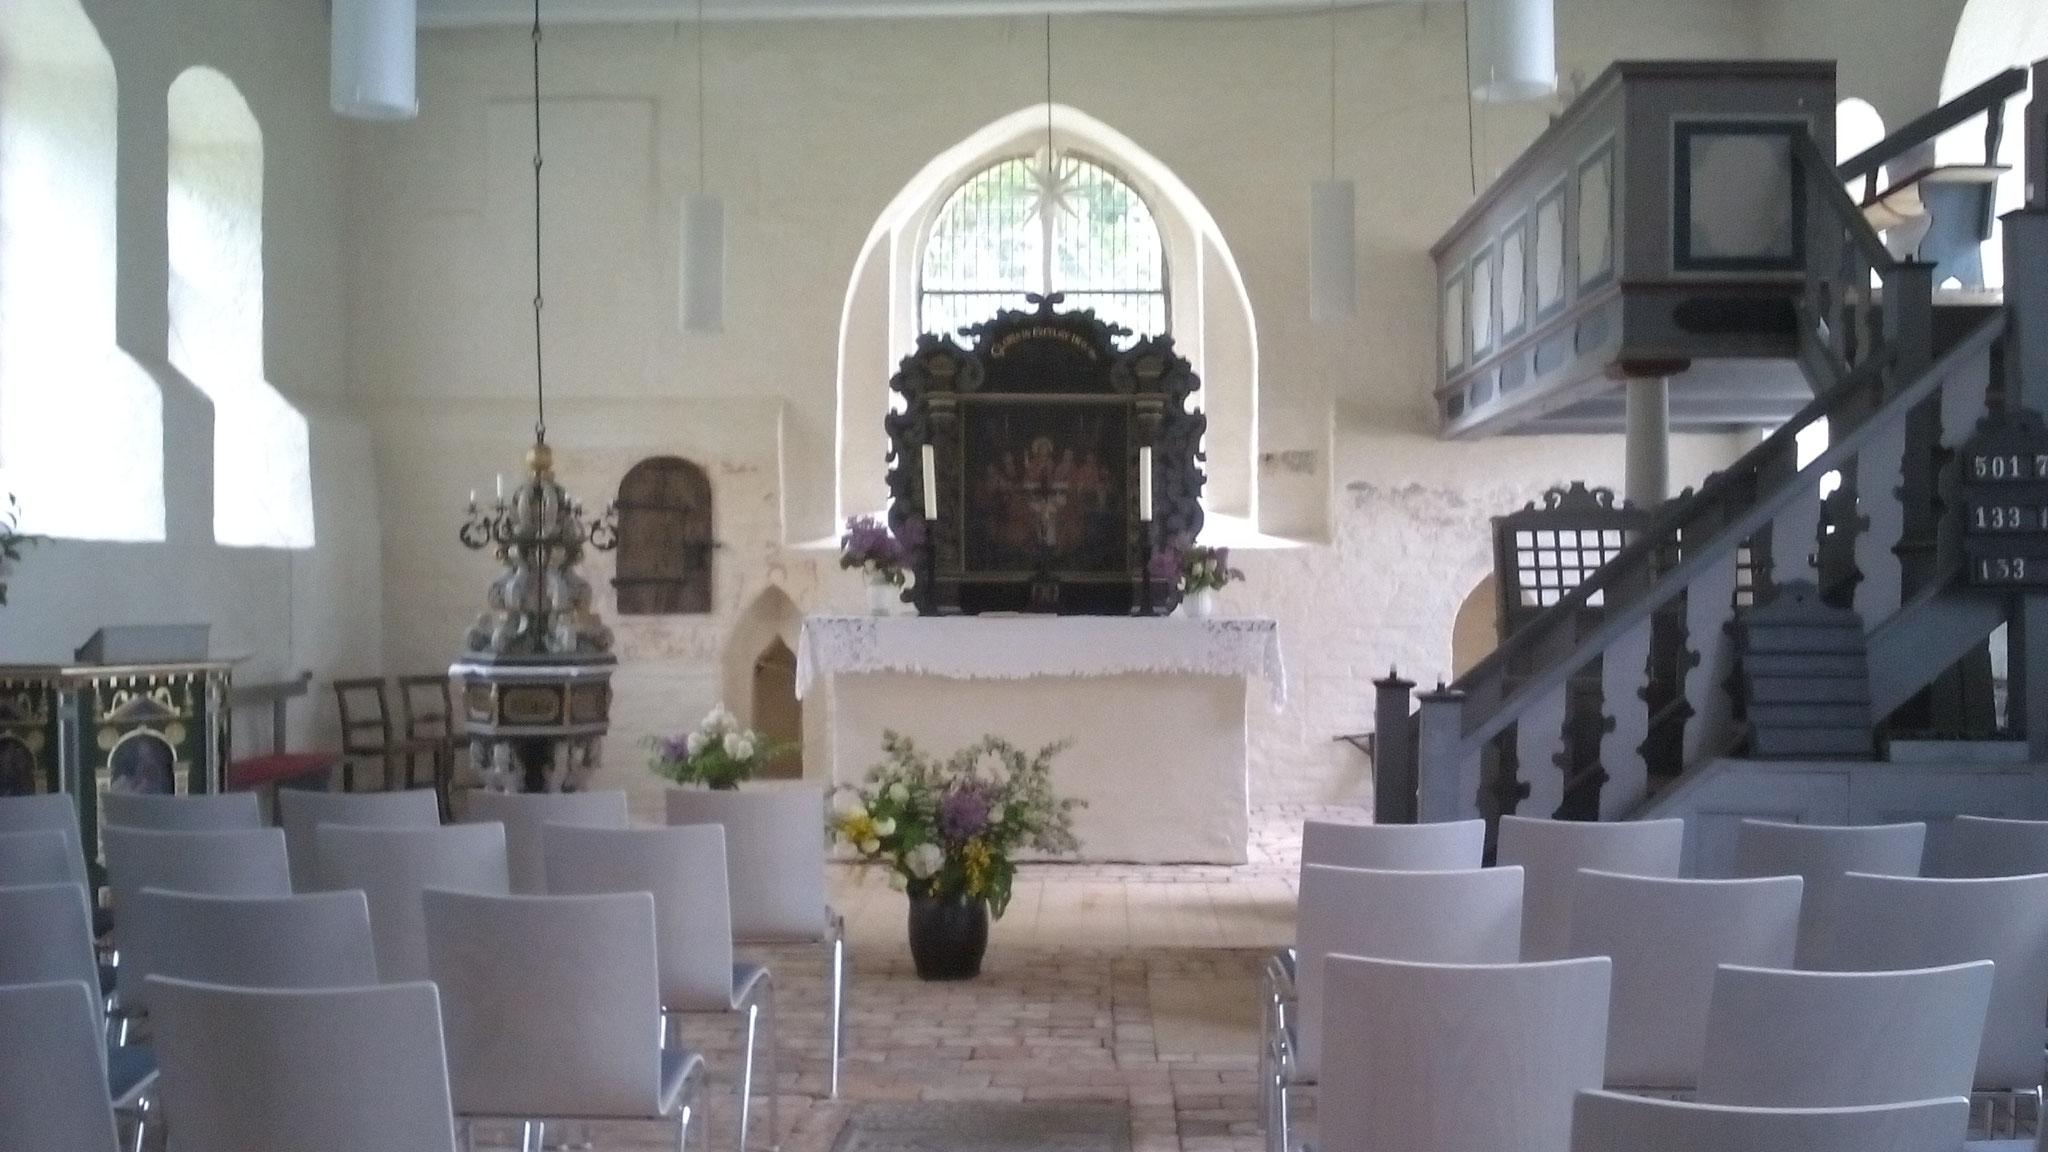 Wunderschöne Kirche